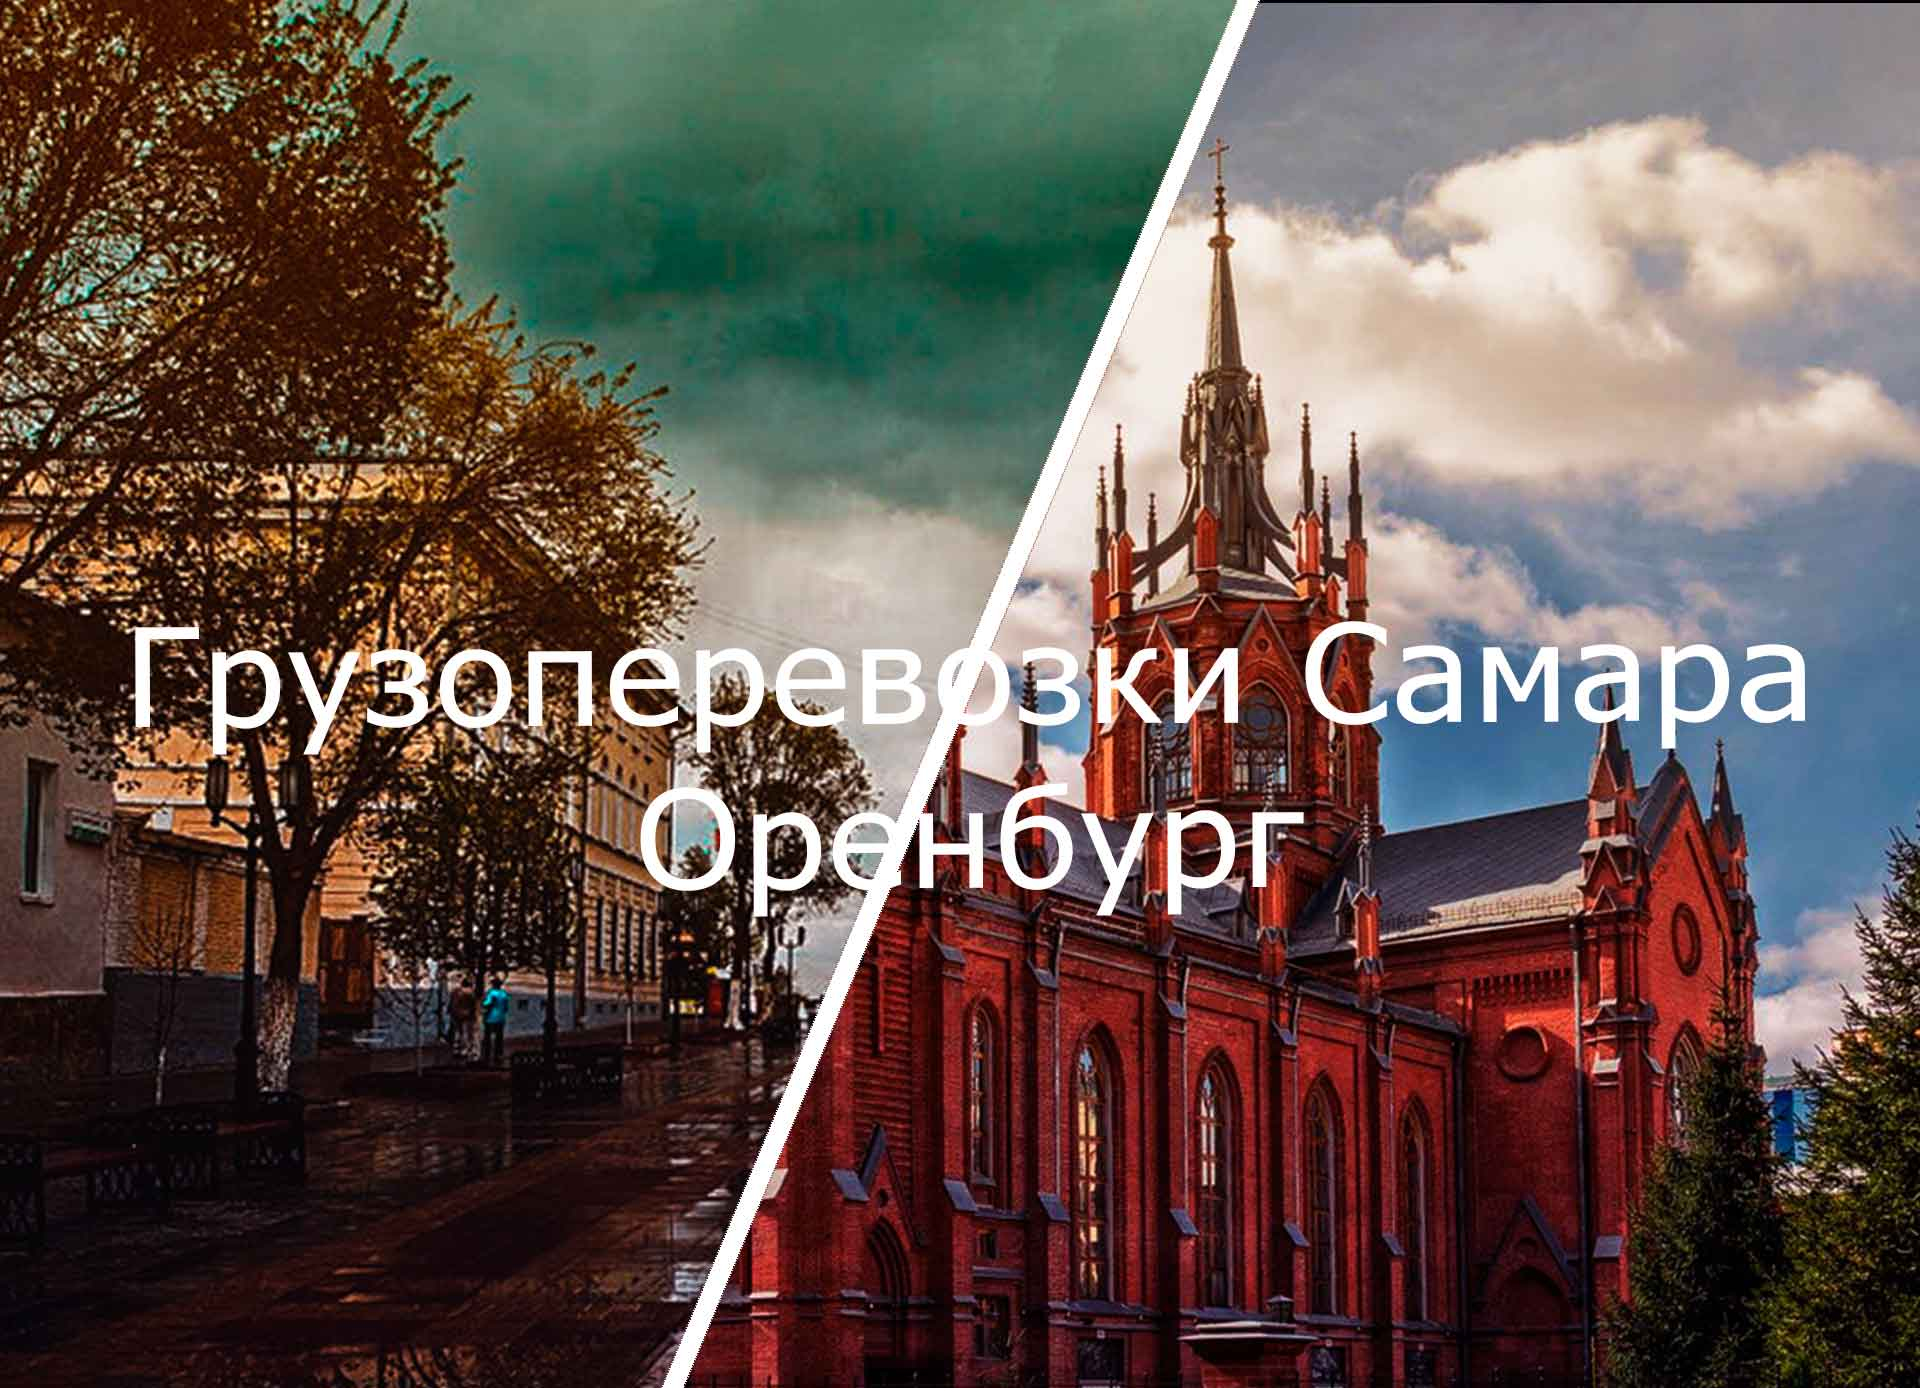 грузоперевозки самара оренбург